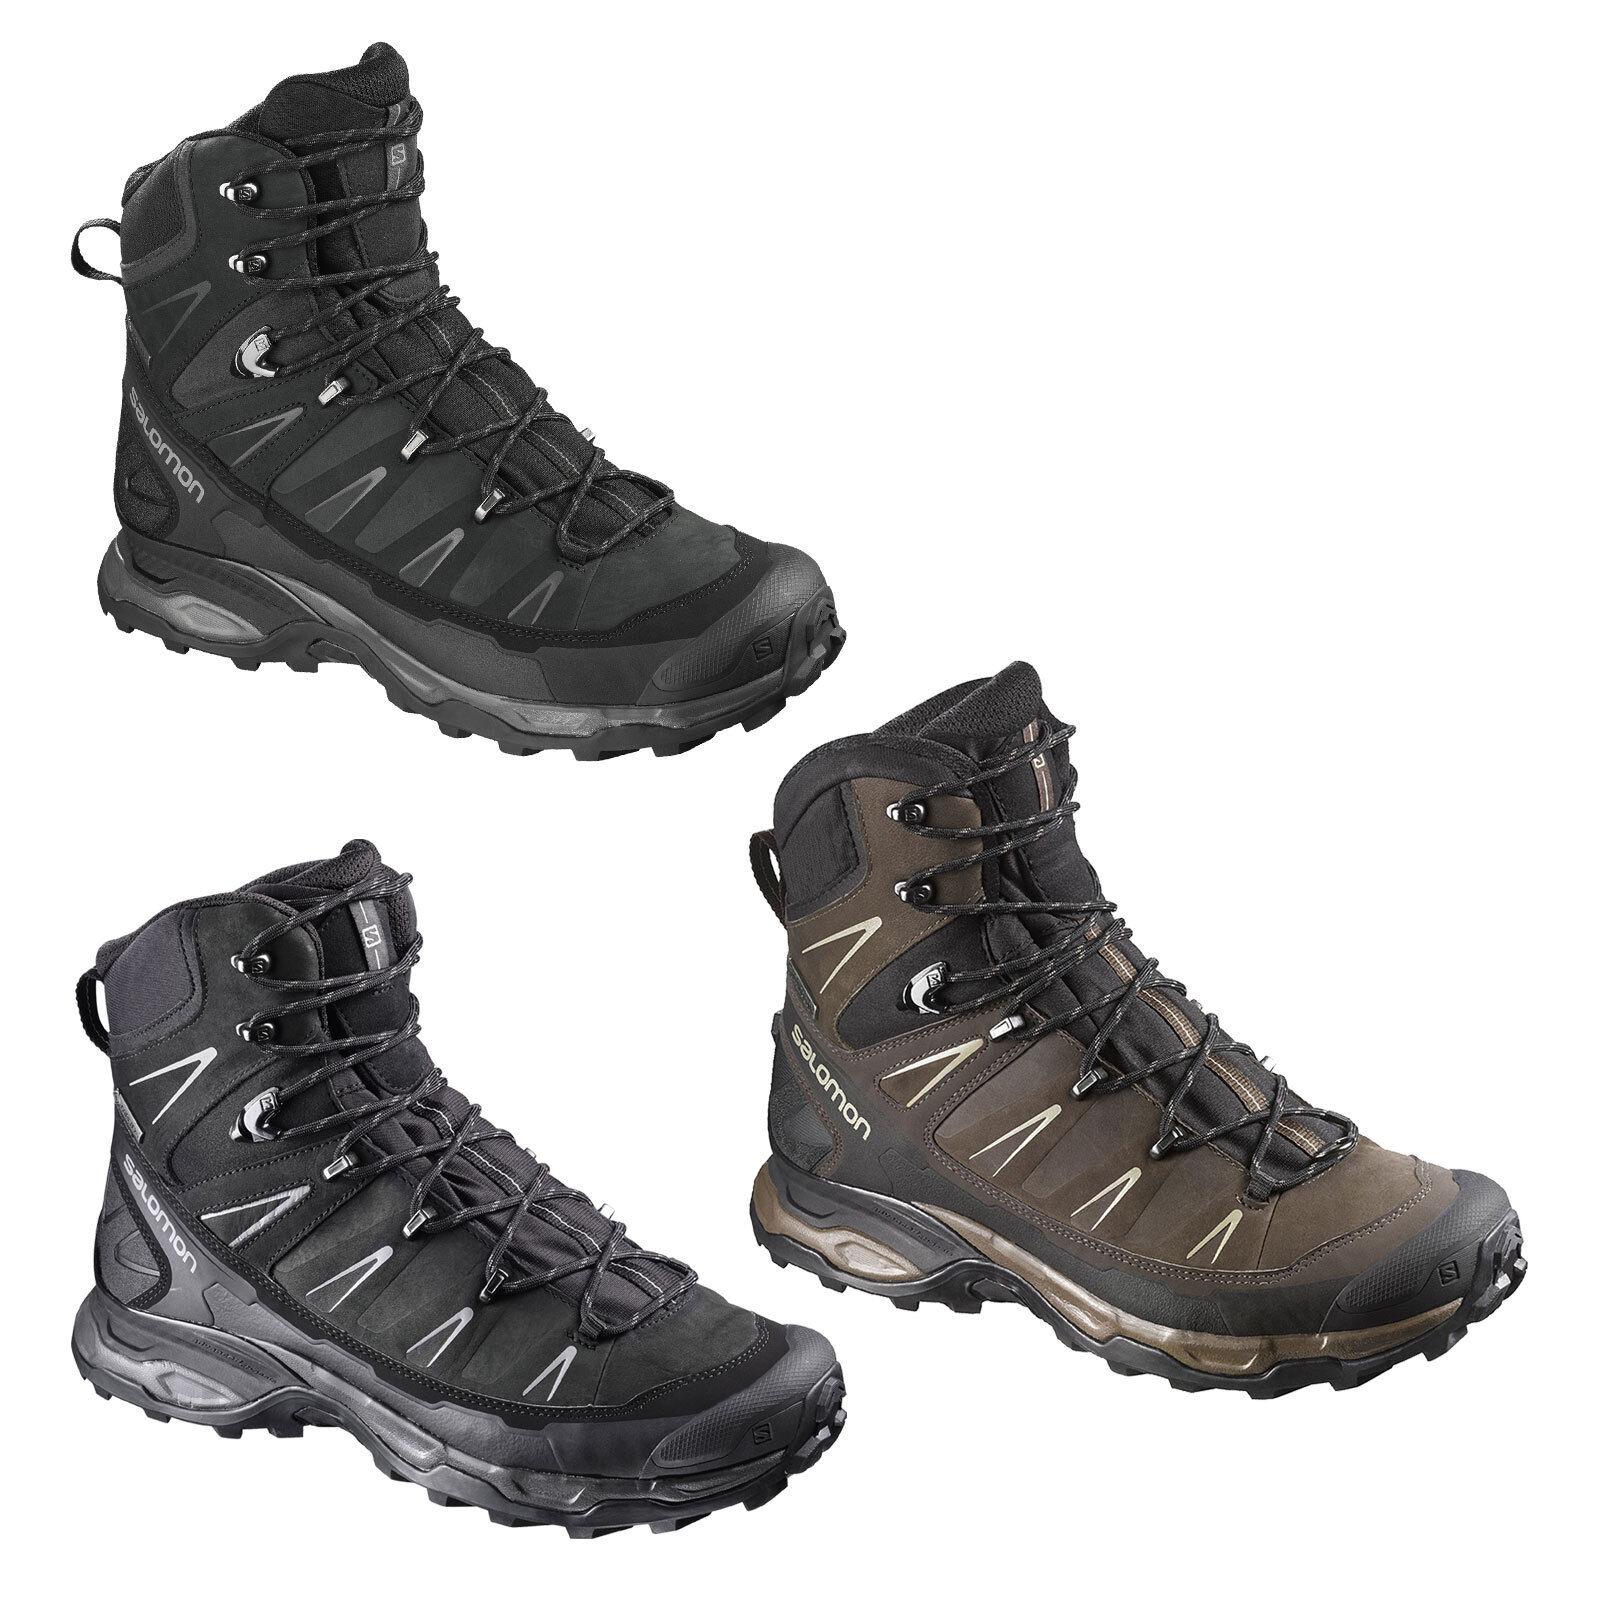 Salomon X Ultra GTX Trek Goretex impermeable caballeros-botín de senderisml botas trekking